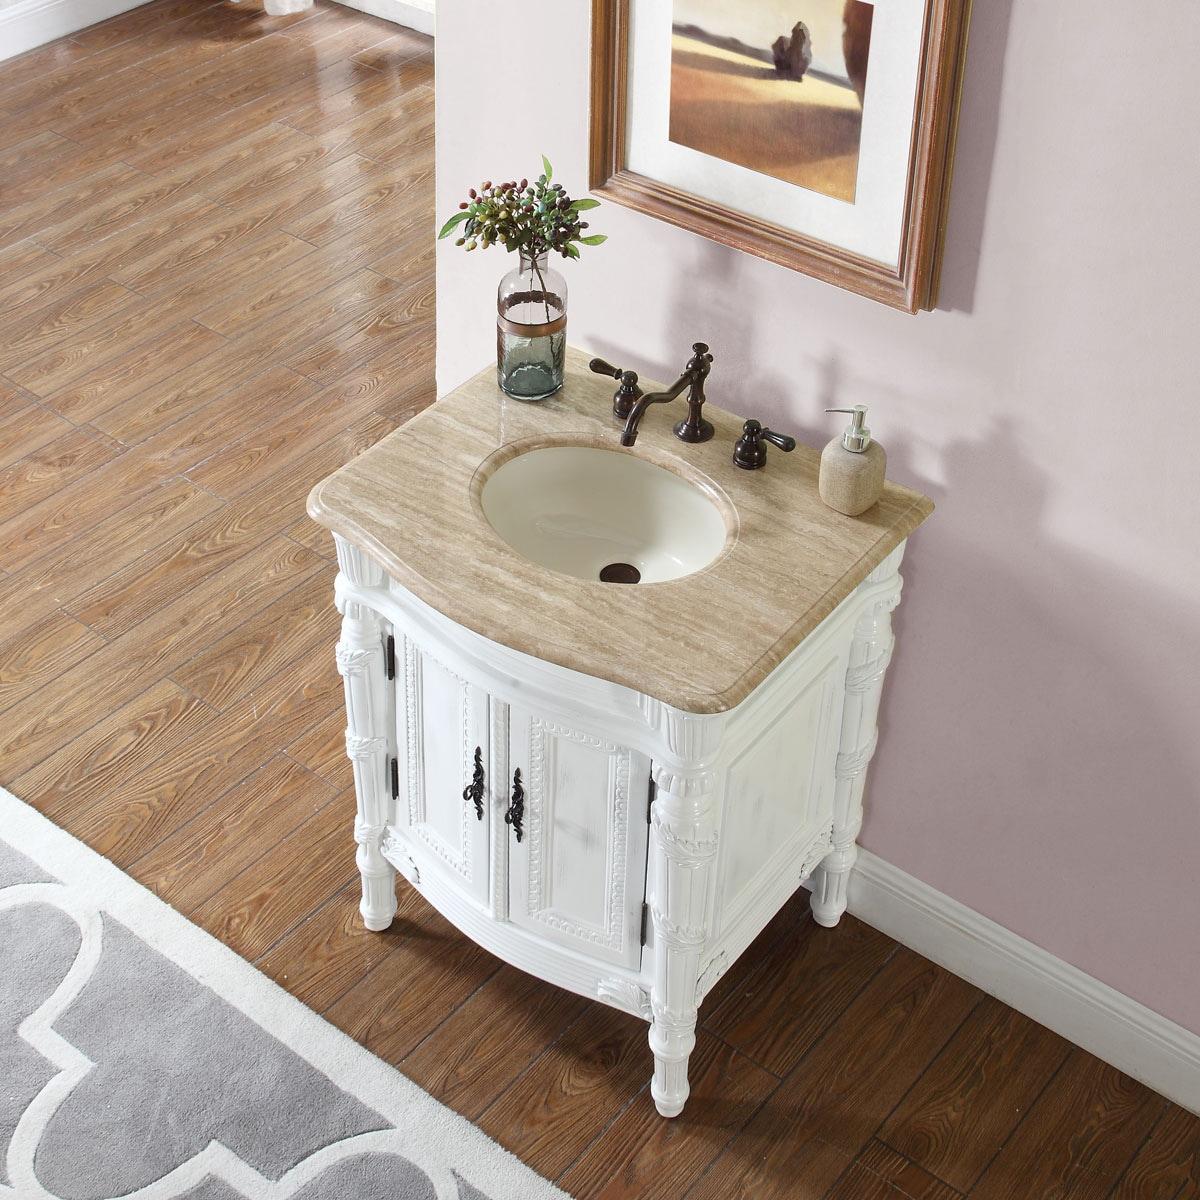 Shop Silkroad Exclusive 26-inch Stone Counter Top Bathroom Vanity ...